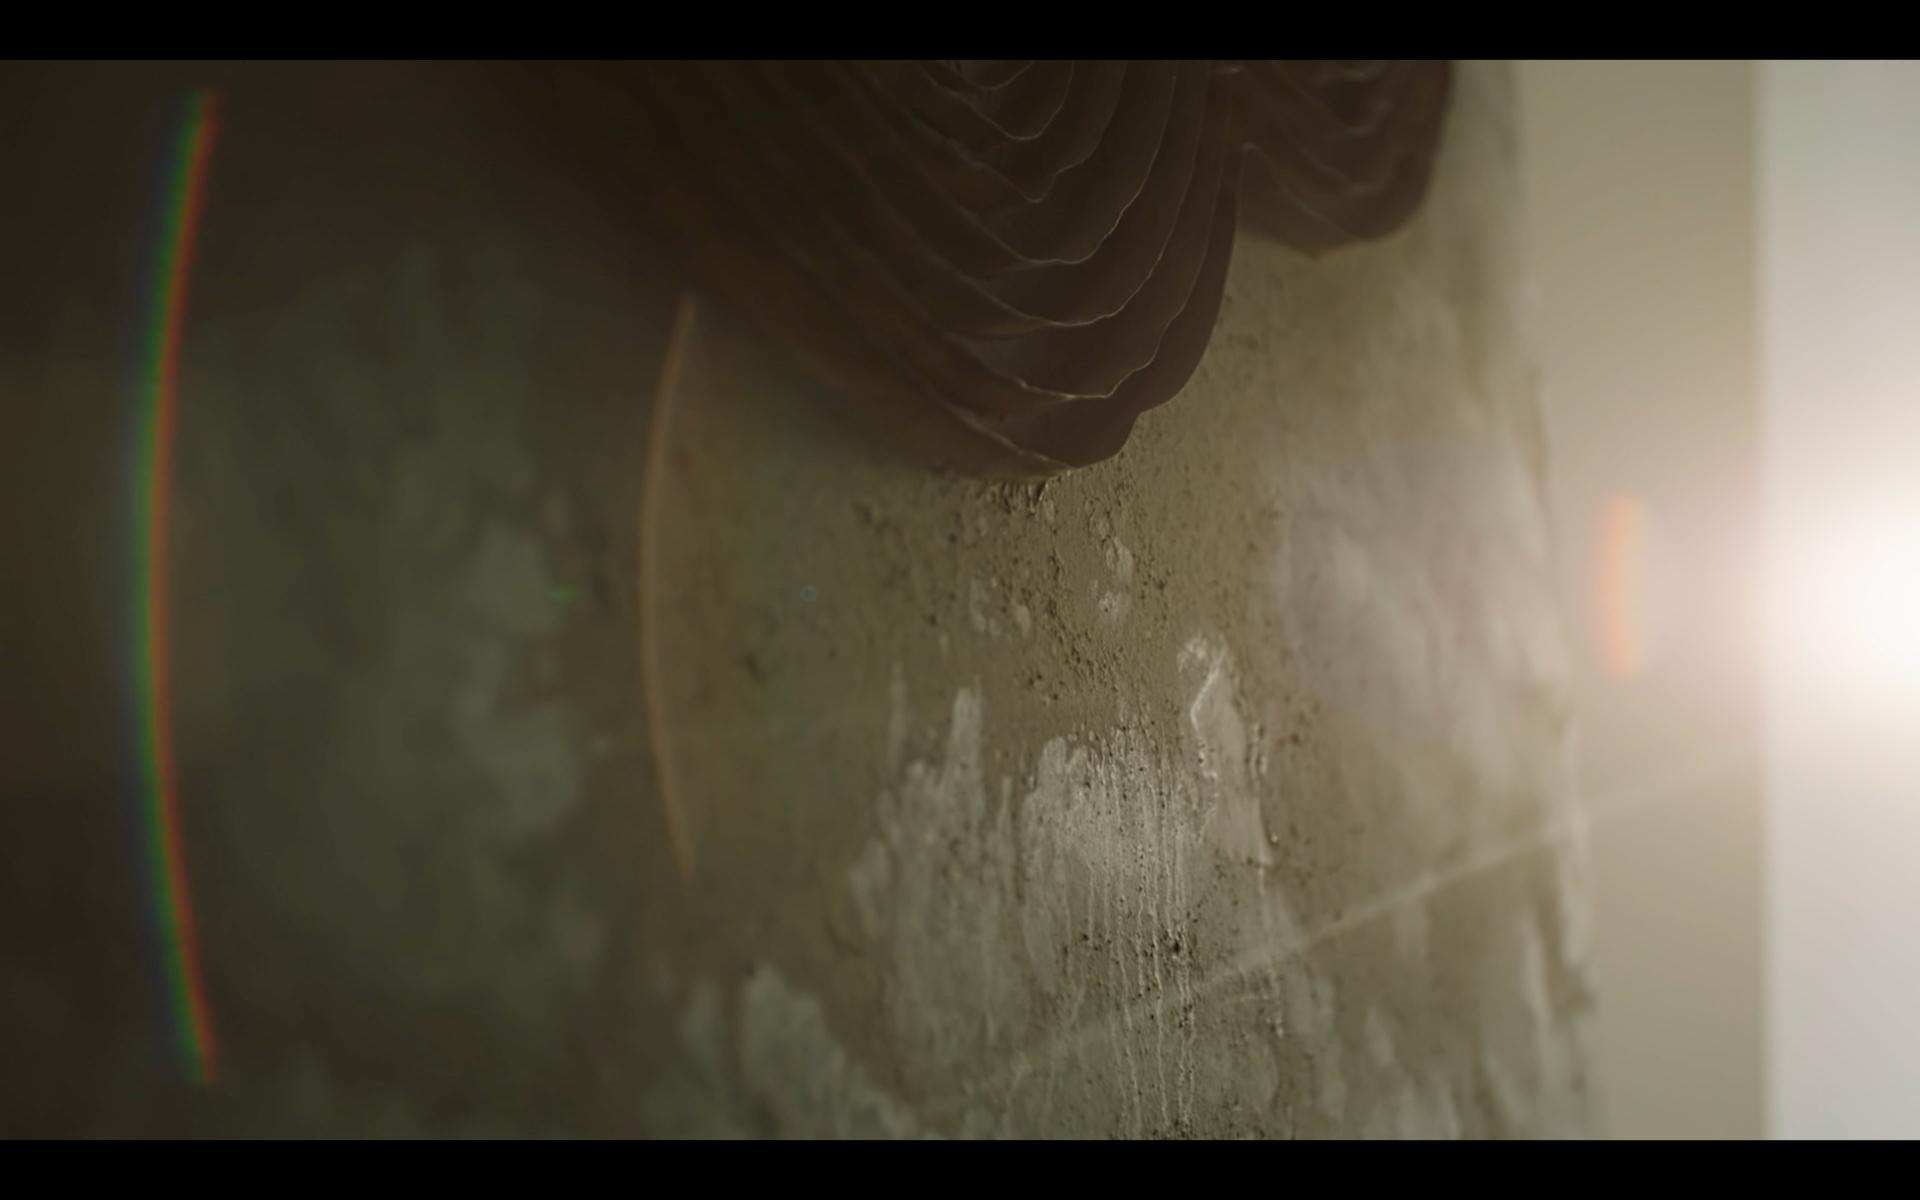 KYLE MACFADZEAN - Screenshot 2021-04-26 at 00.35.34